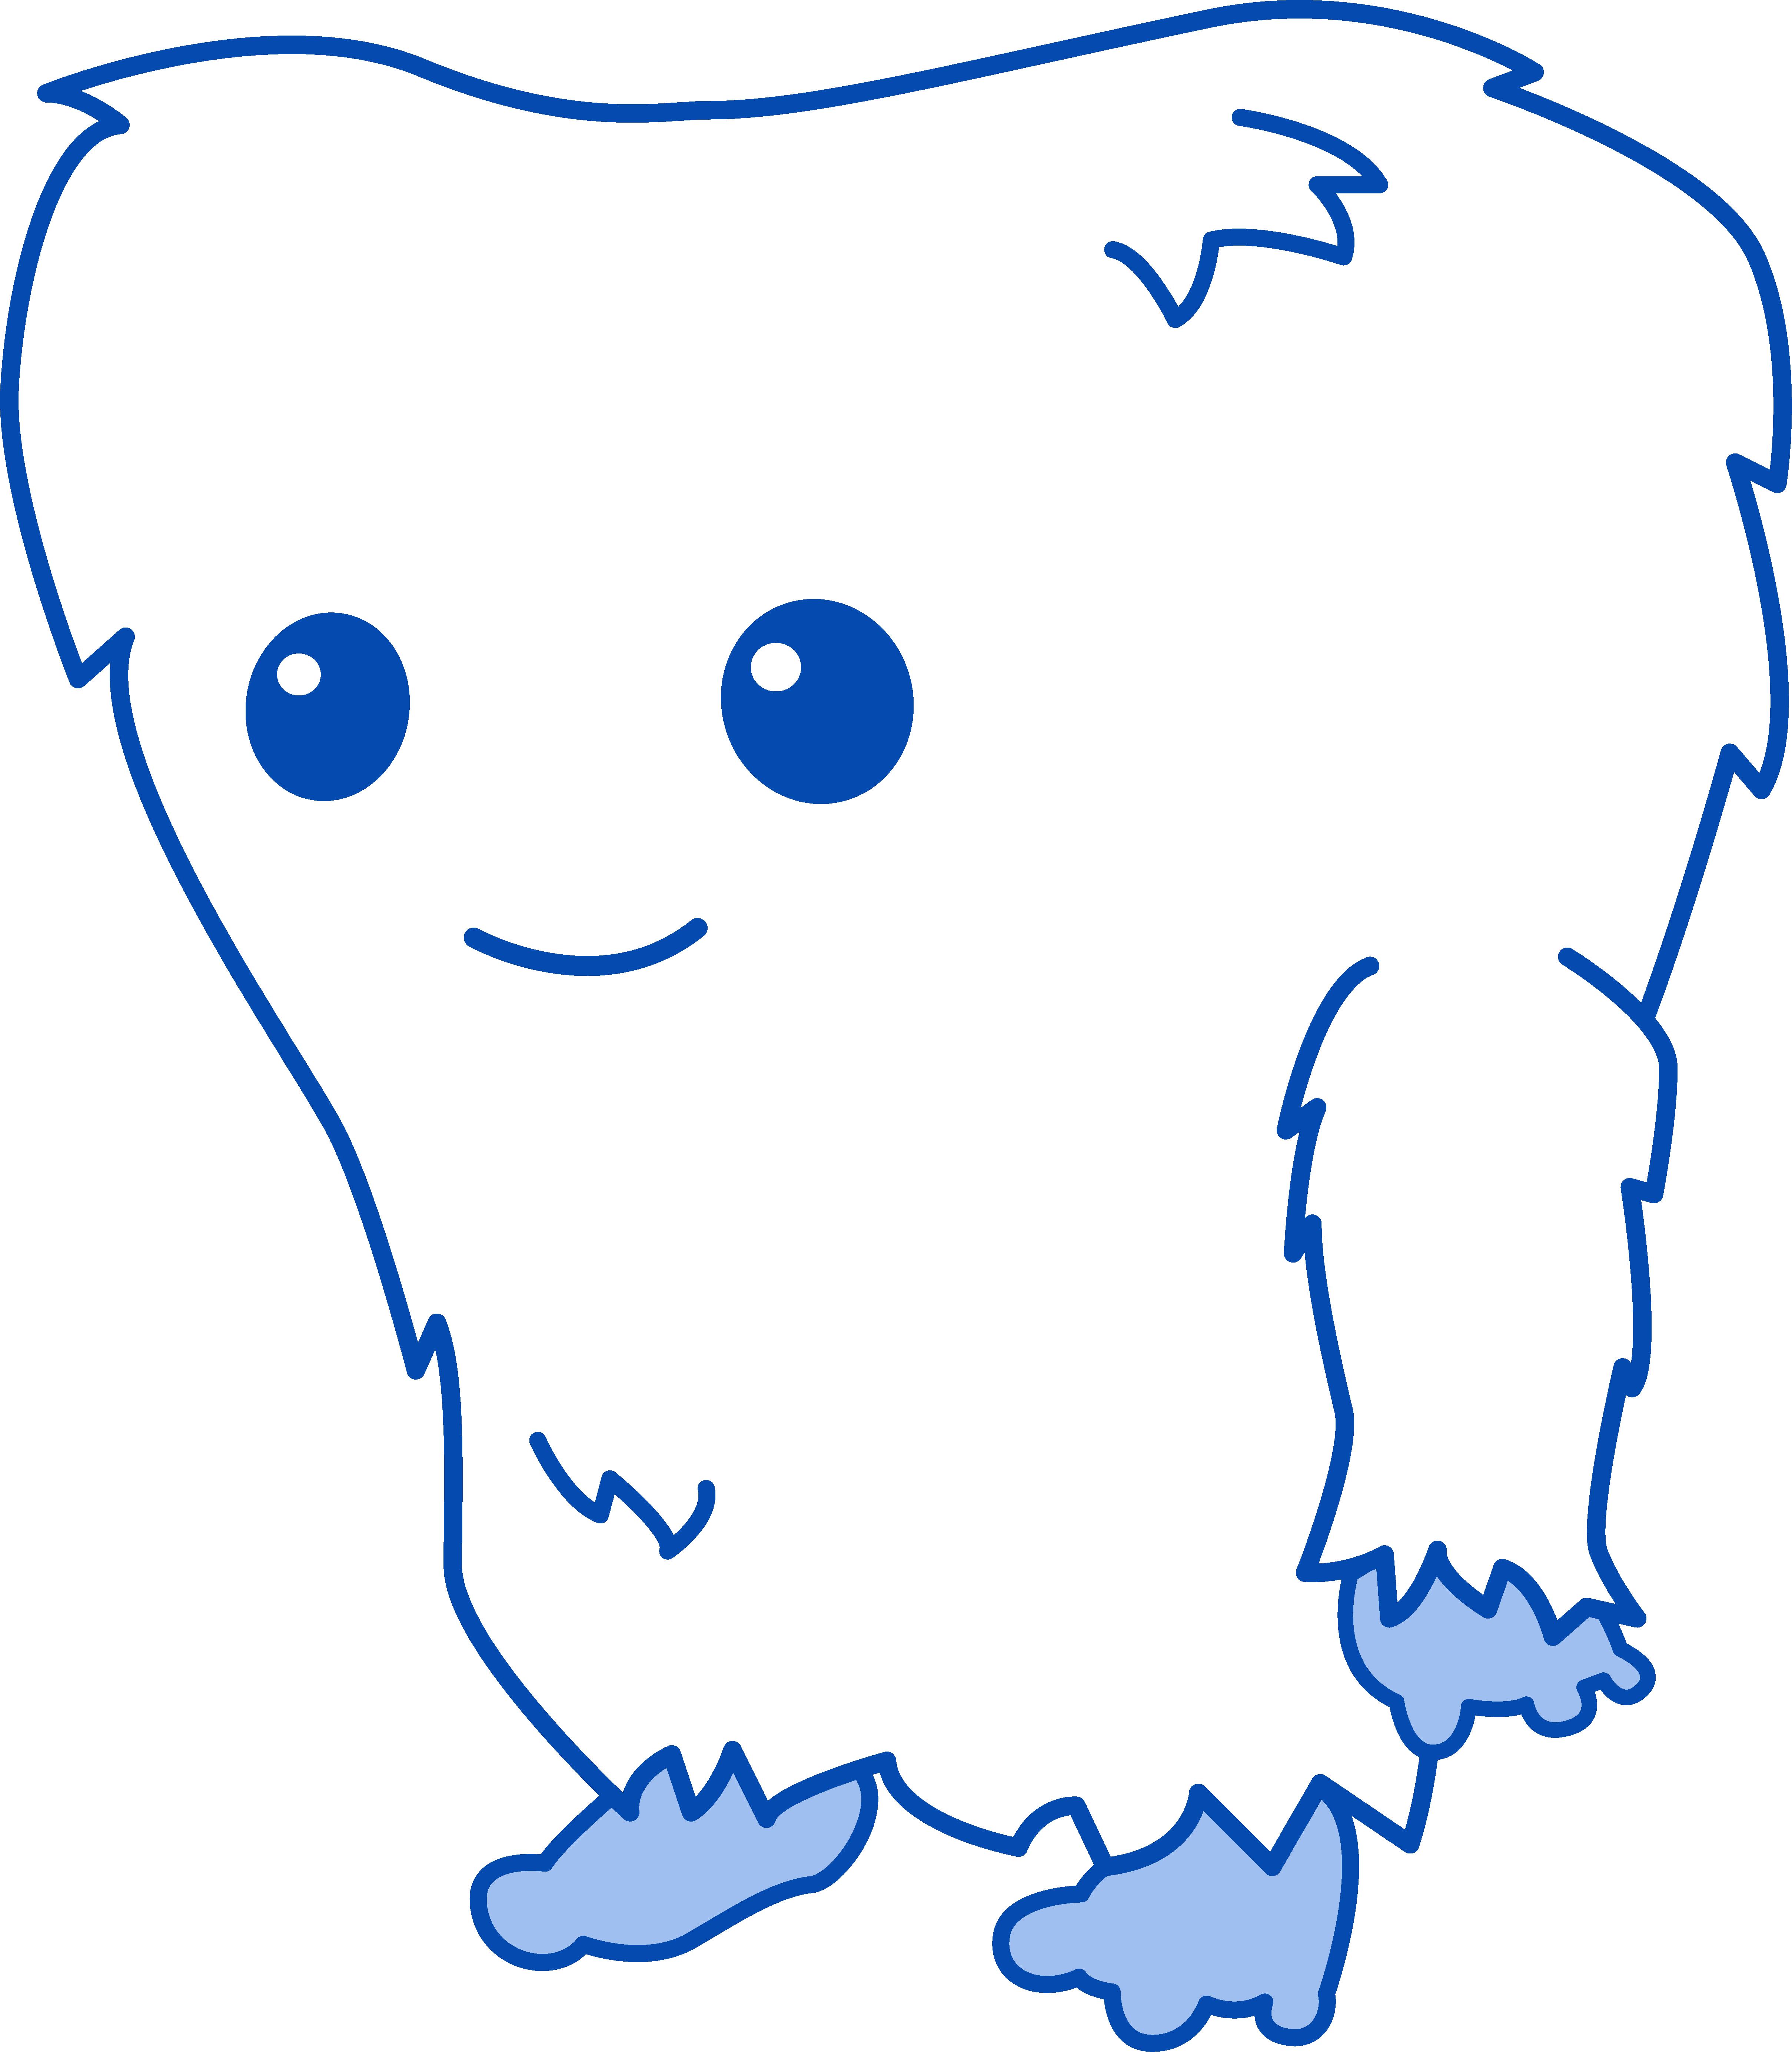 Olaf clipart abominable snowman. Cute little yeti monster